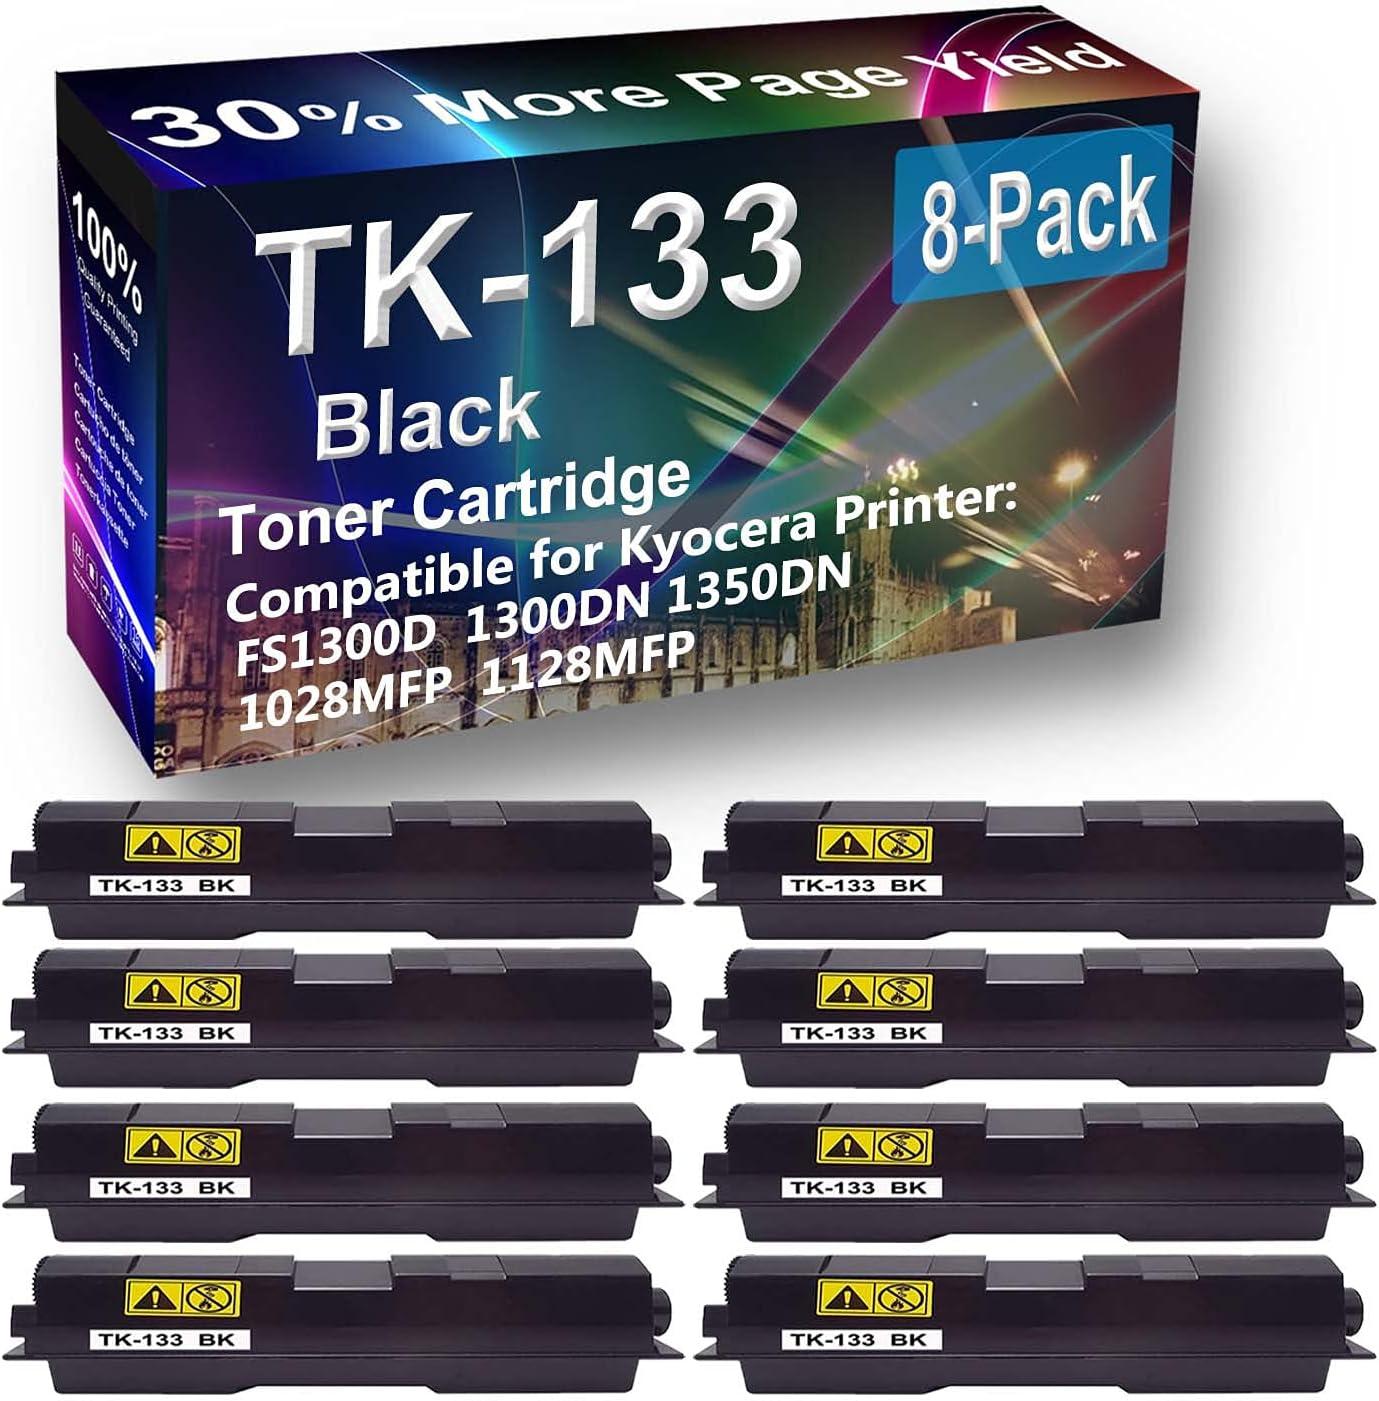 8-Pack Compatible High Yield 1350DN Printer Cartridge Replacement for Kyocera TK133 (TK-133) Toner Cartridge (Black)